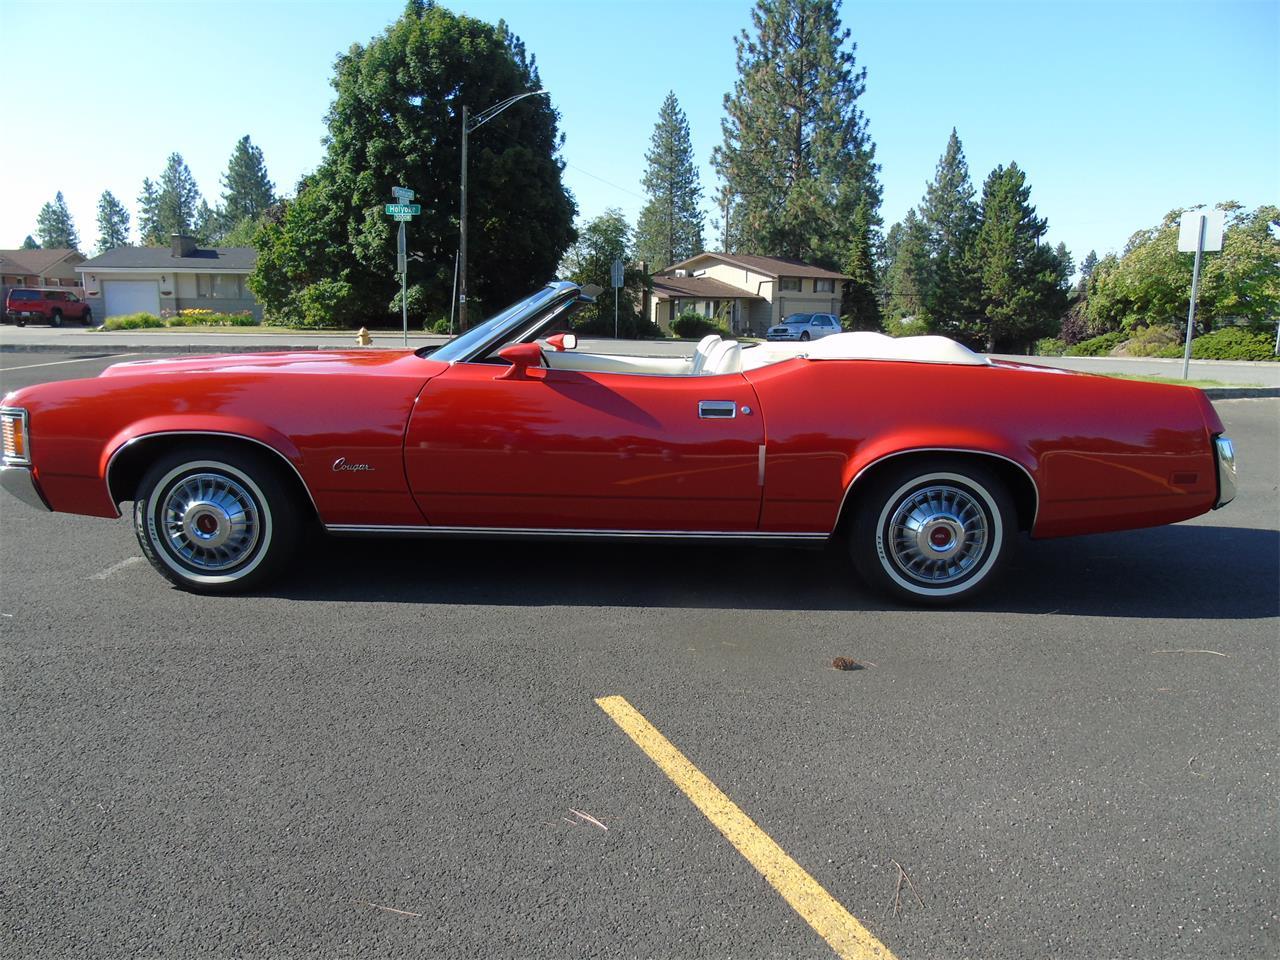 1972 Mercury Cougar XR7 (CC-1244758) for sale in Spokane, Washington